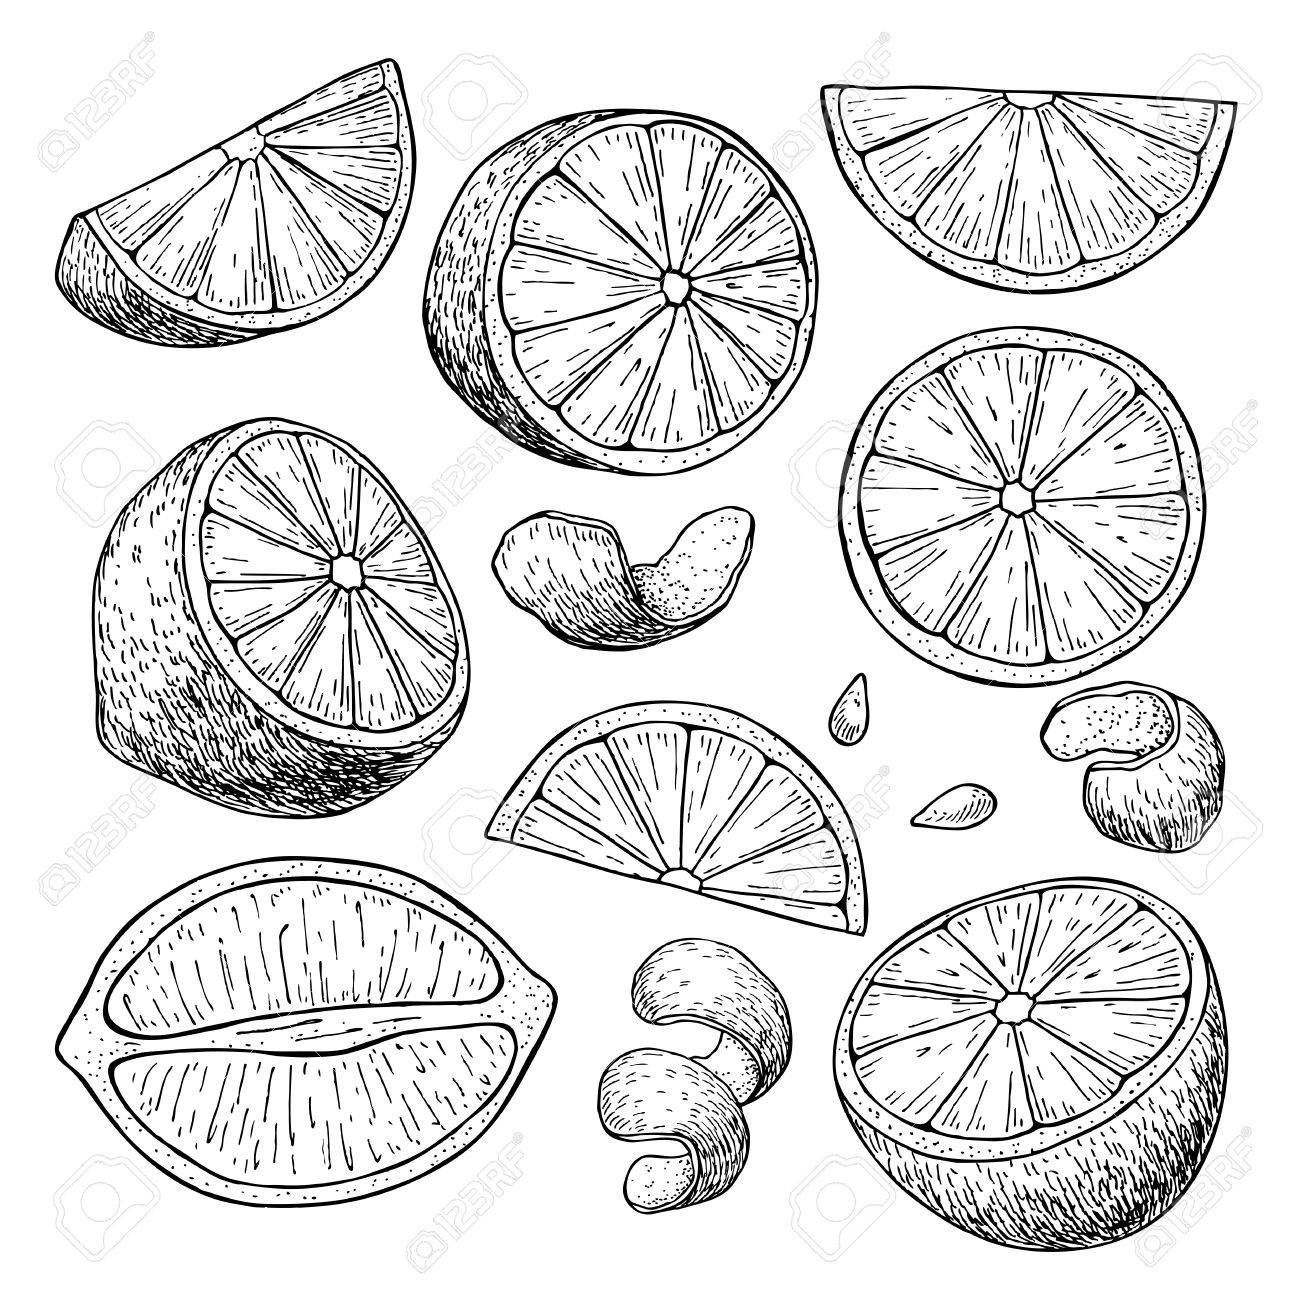 1300x1300 Vector Hand Drawn Lime Or Lemon Set. Whole Lemon, Sliced Pieces